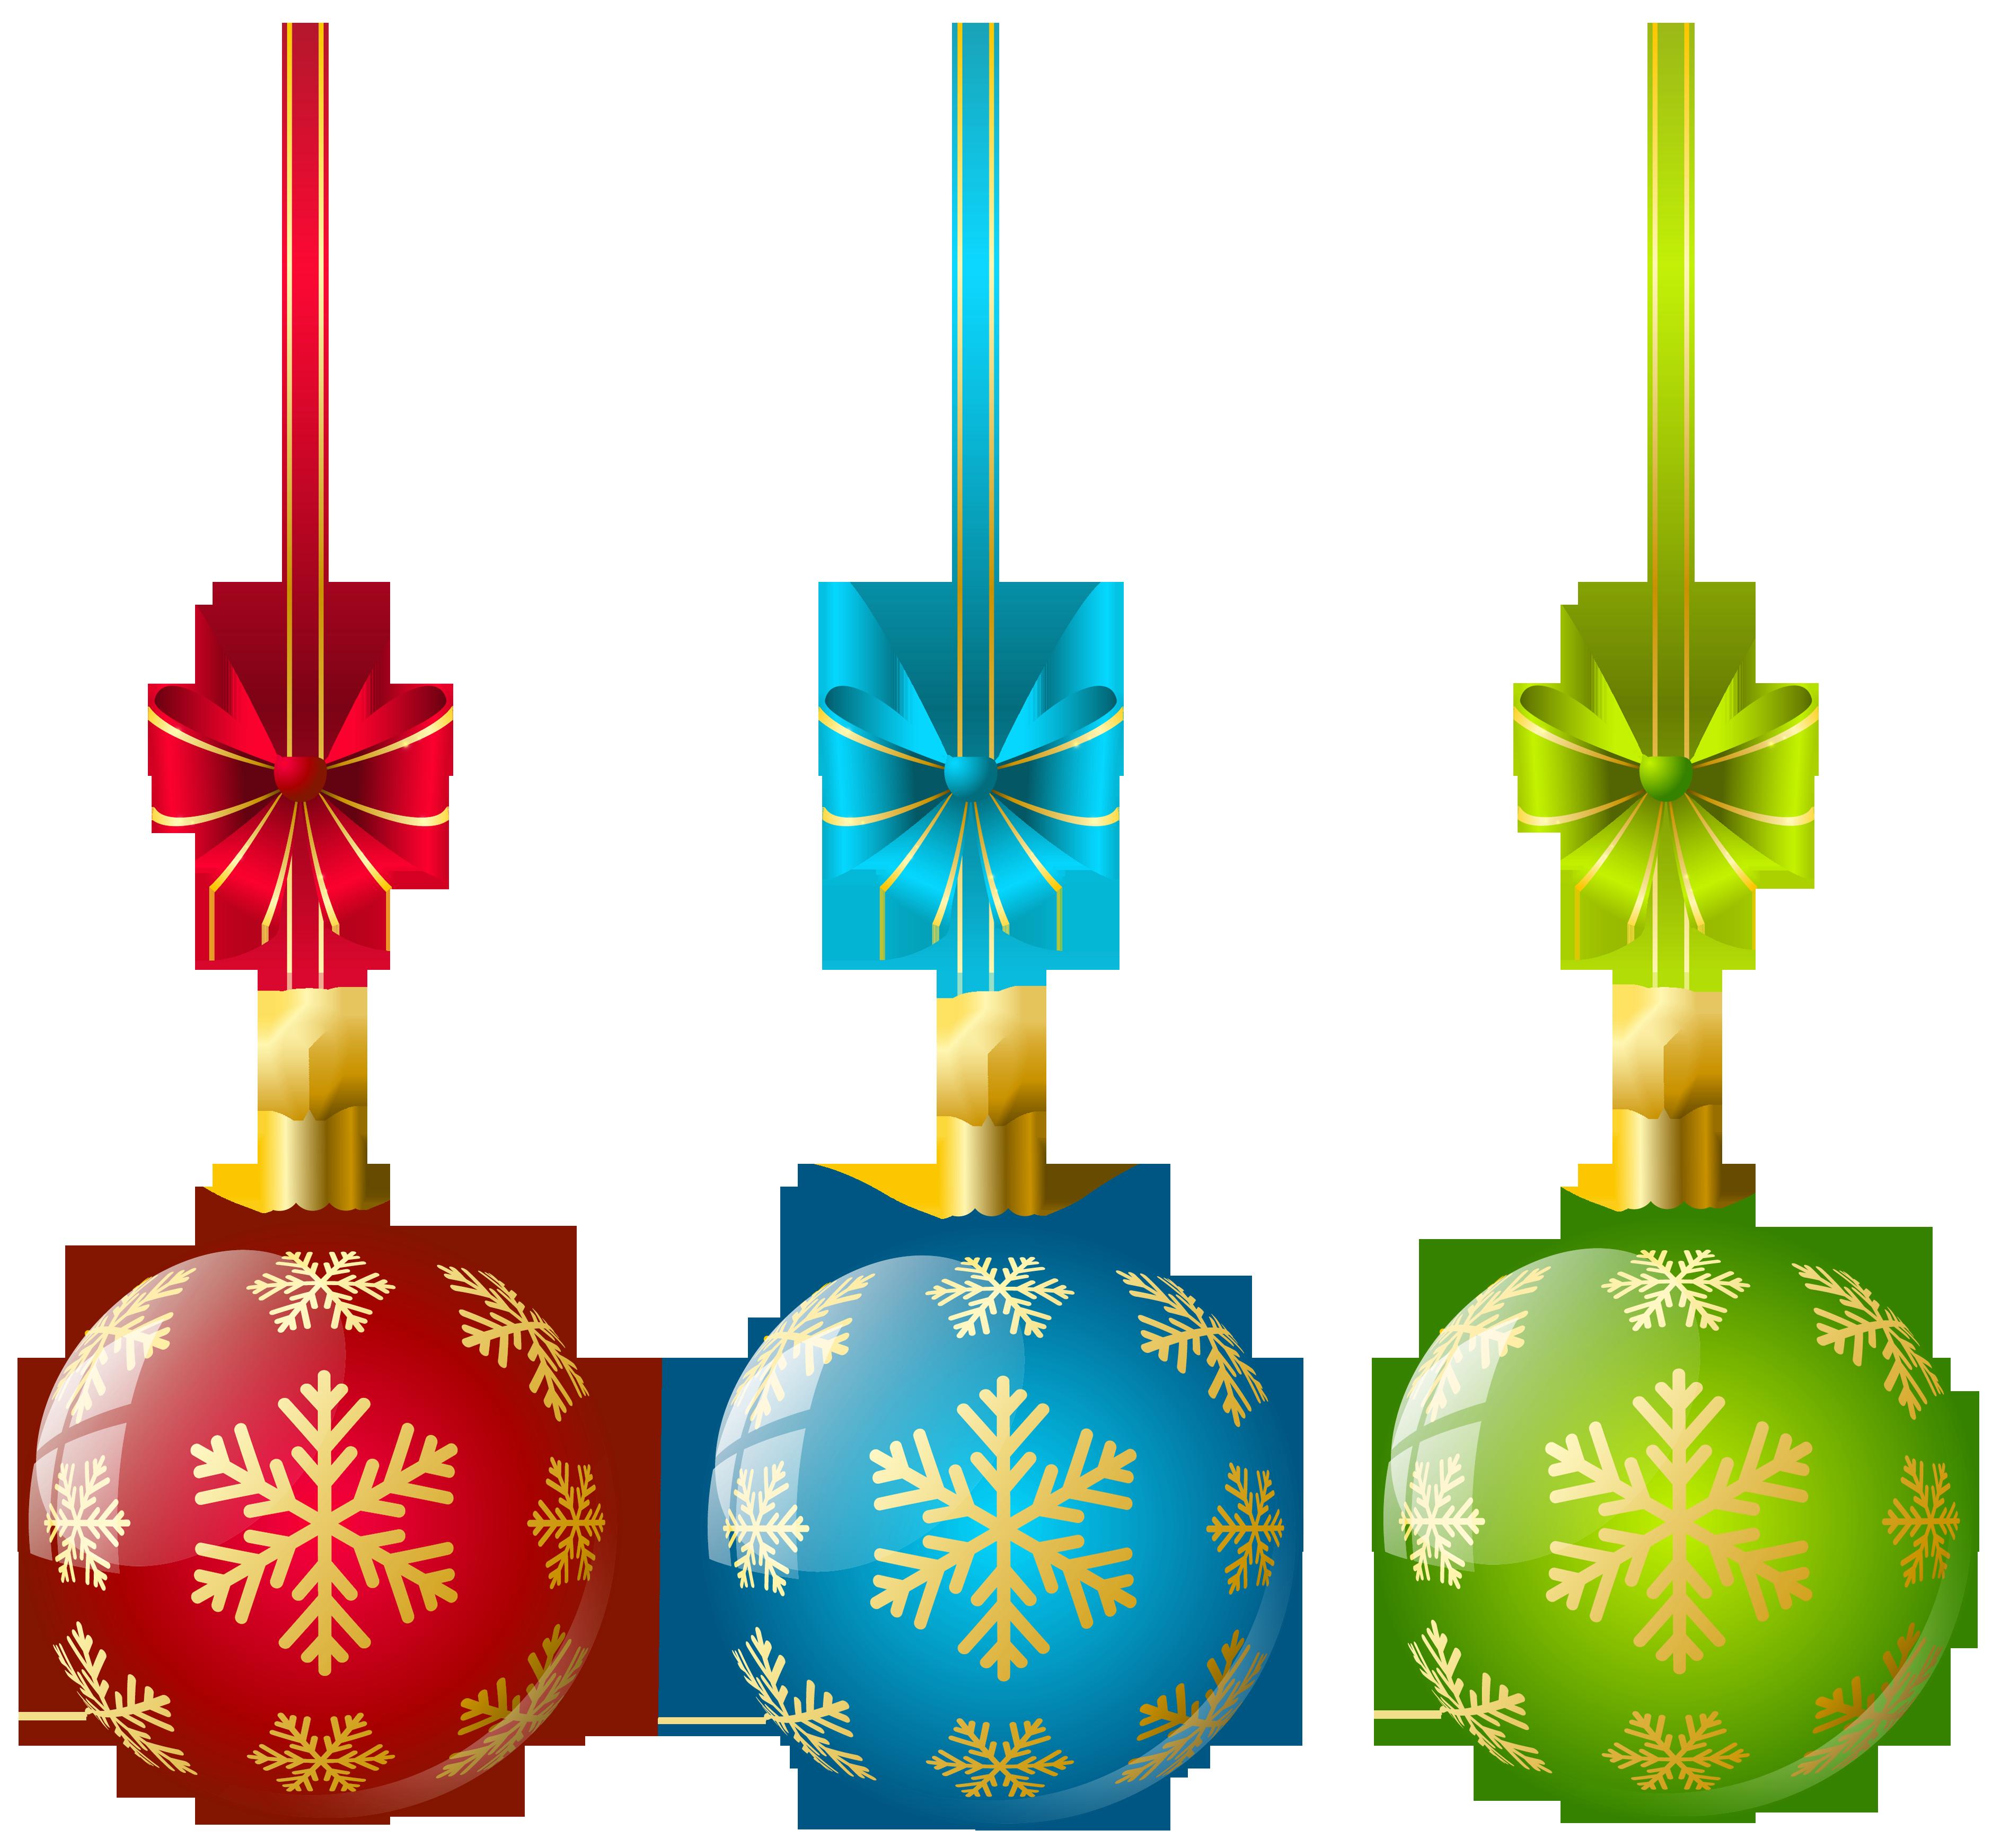 Christmas Ornament Clip Art Cliparts Co-Christmas Ornament Clip Art Cliparts Co-6